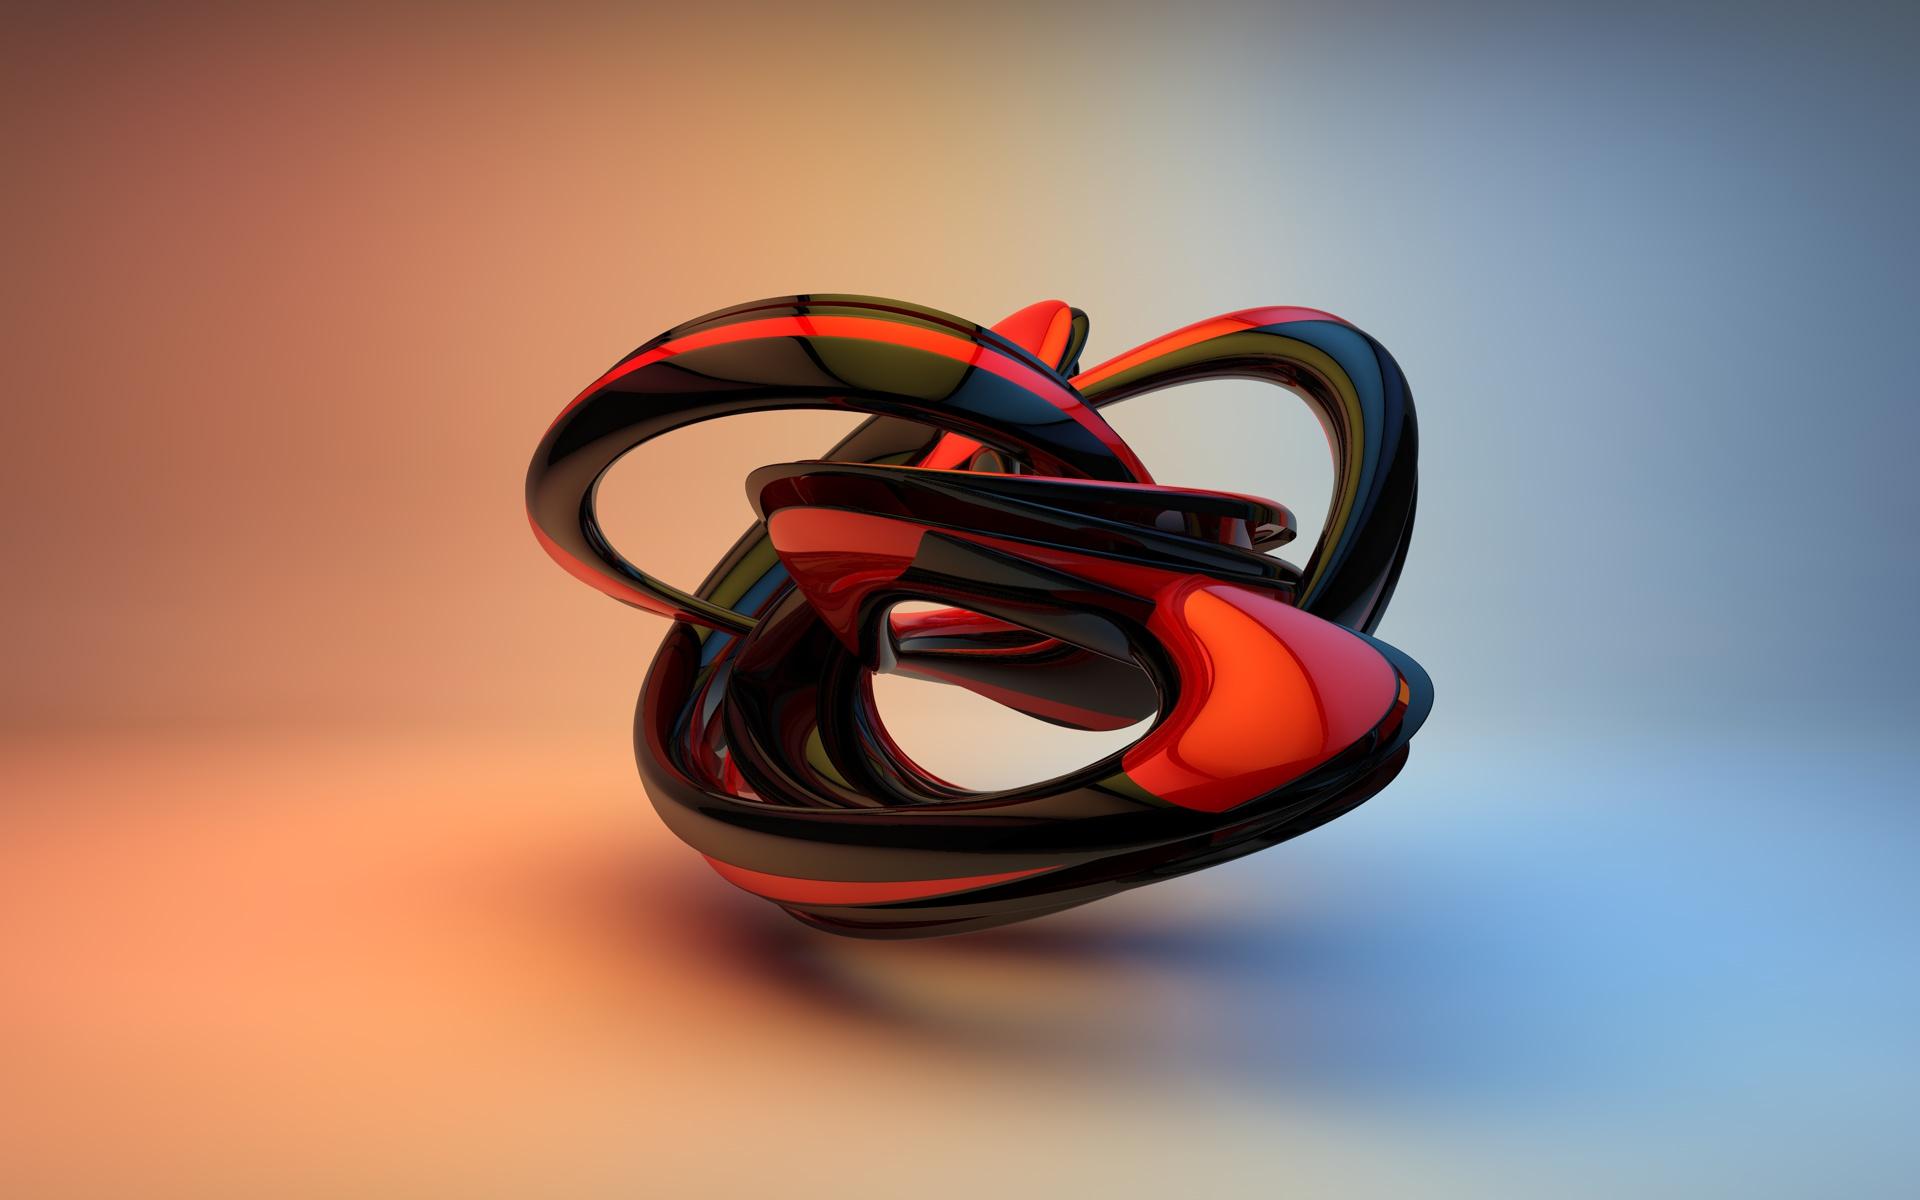 Torus rainbow by KRYPT06